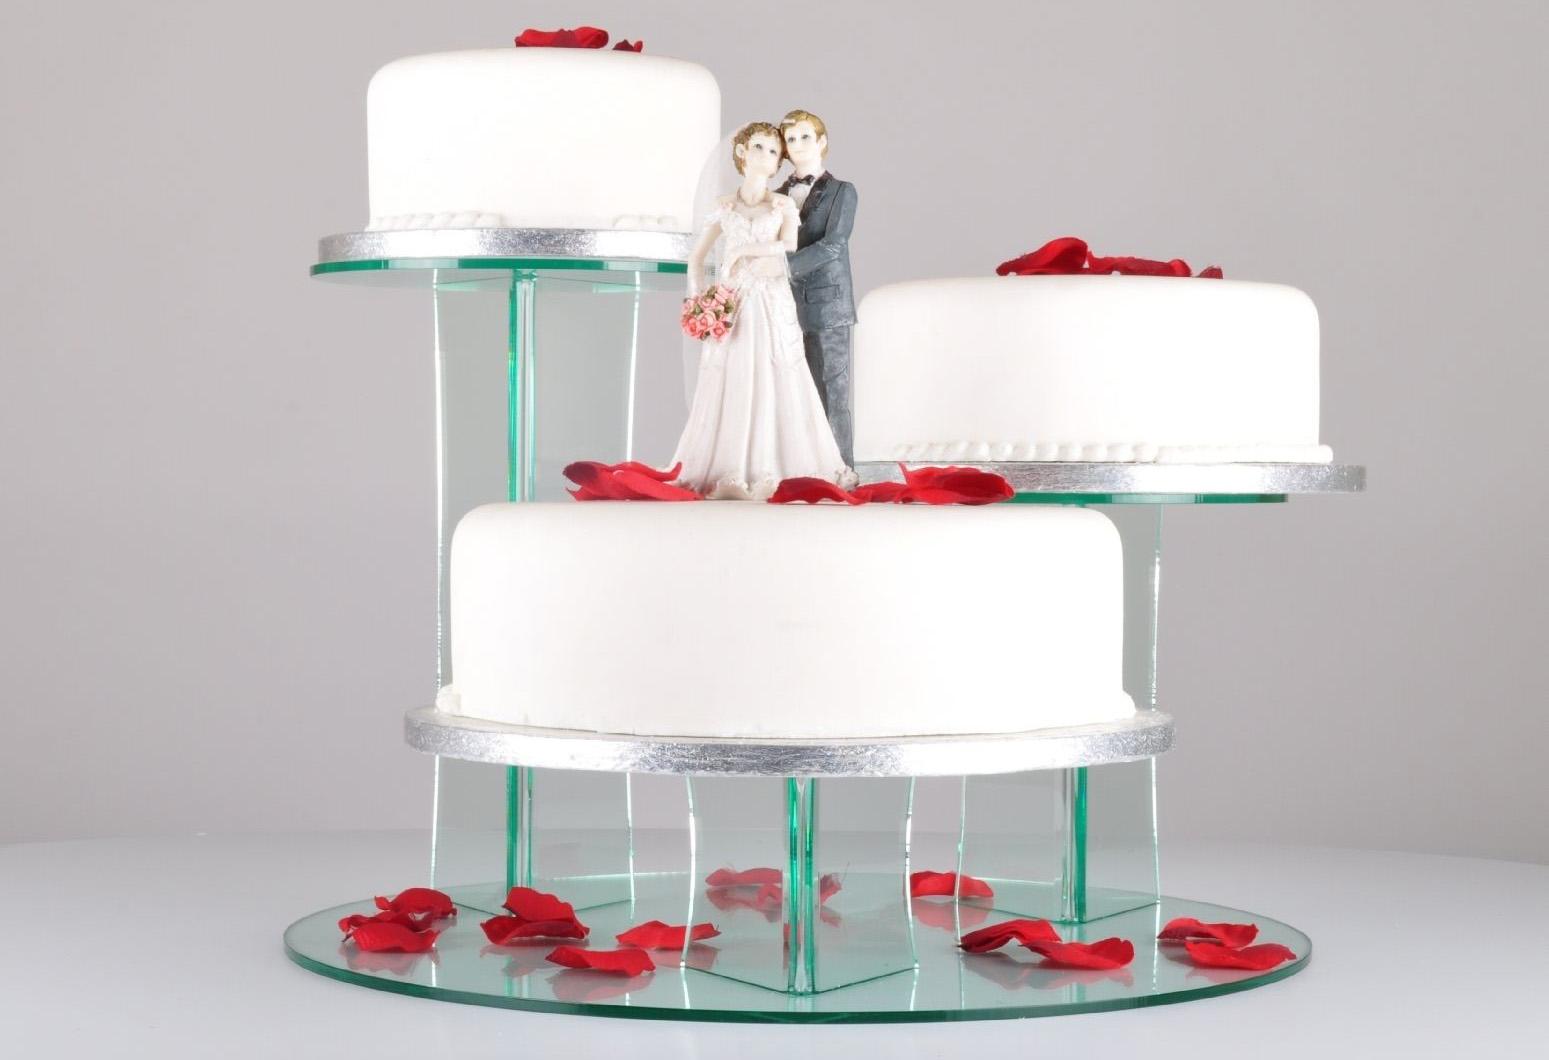 Фото подставки с тортом